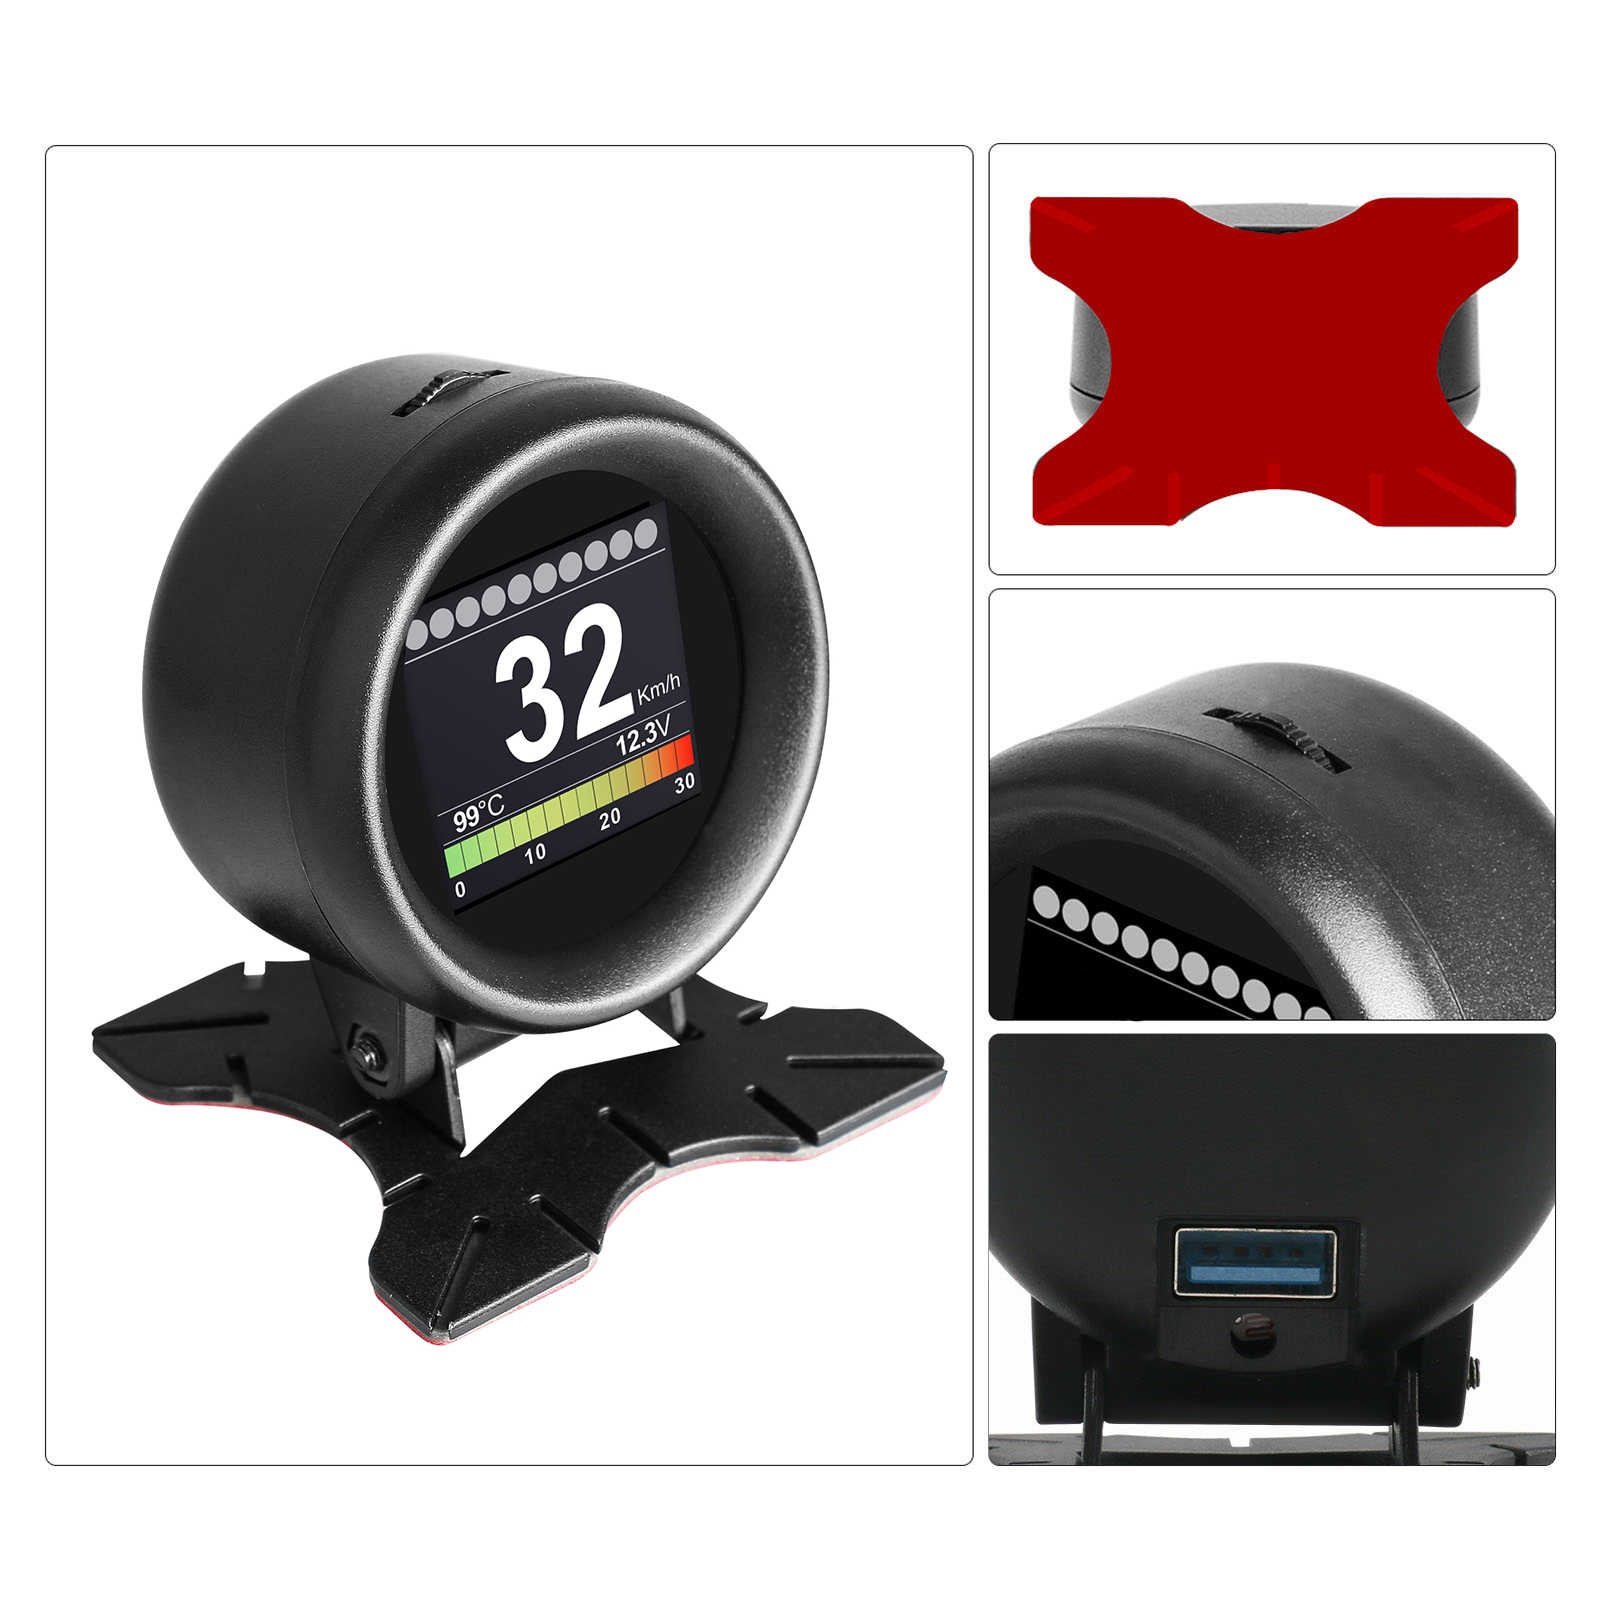 AUTOOL X60 자동차 스마트 디지털 다기능 측정기 디스플레이 속도계 게이지 수온 조기 경보 자동 오류 코드 리더